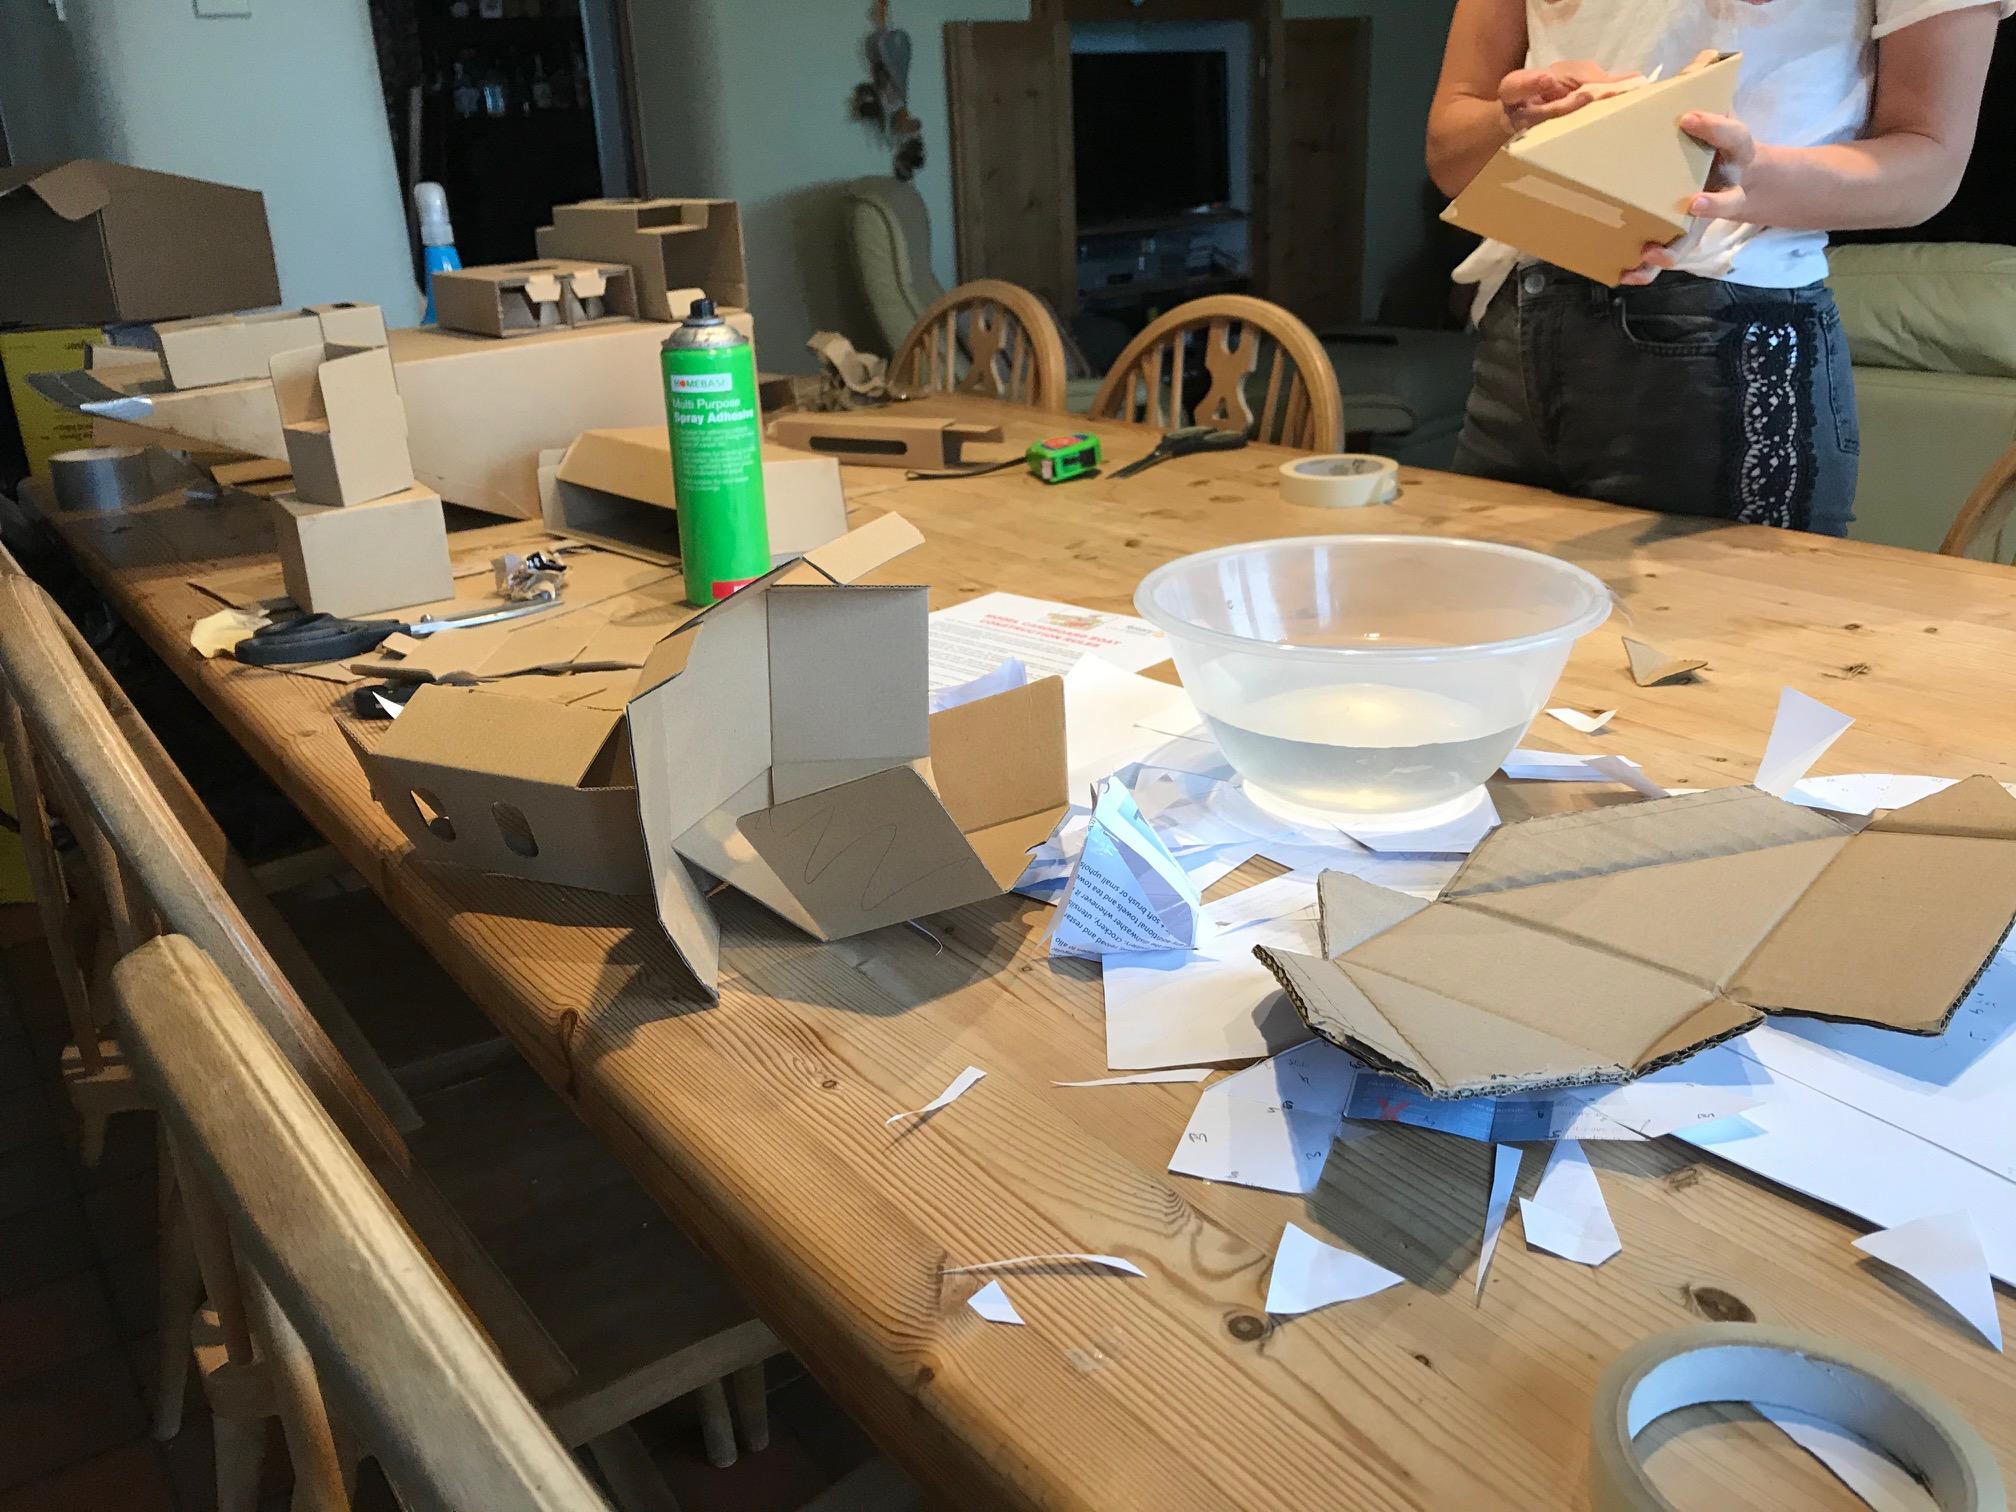 Building model cardboard boats